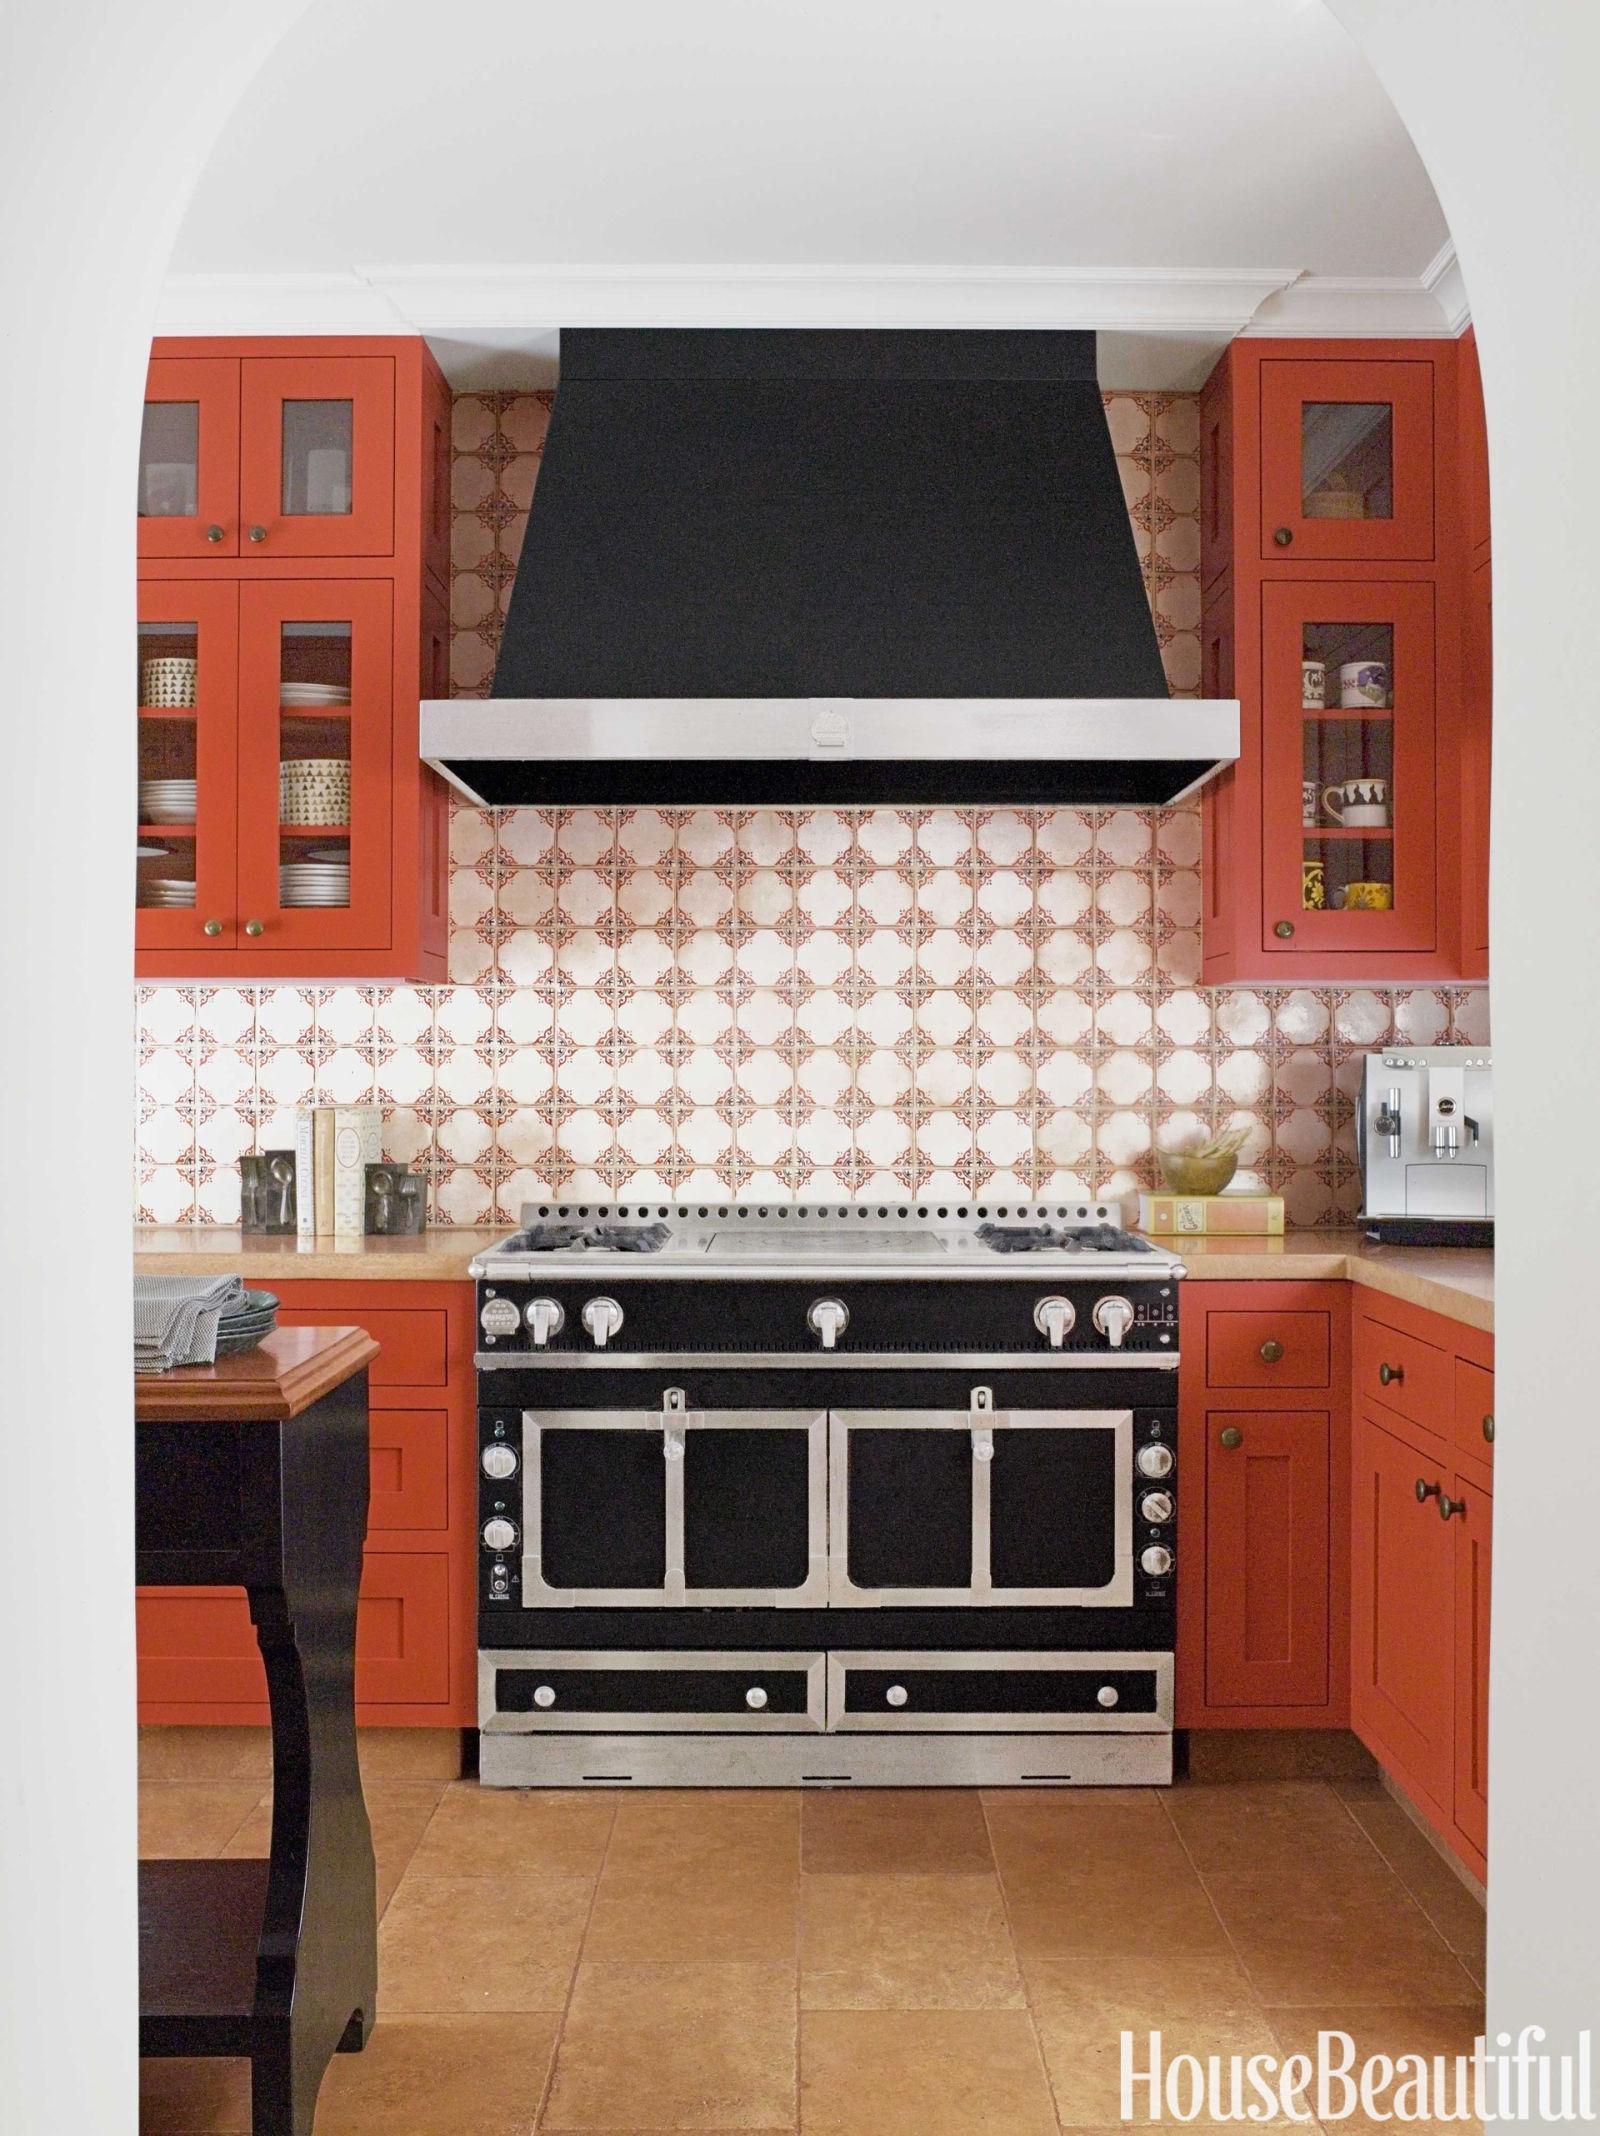 Orange Kitchen Decor: 20 Ideas And Designs photo - 2